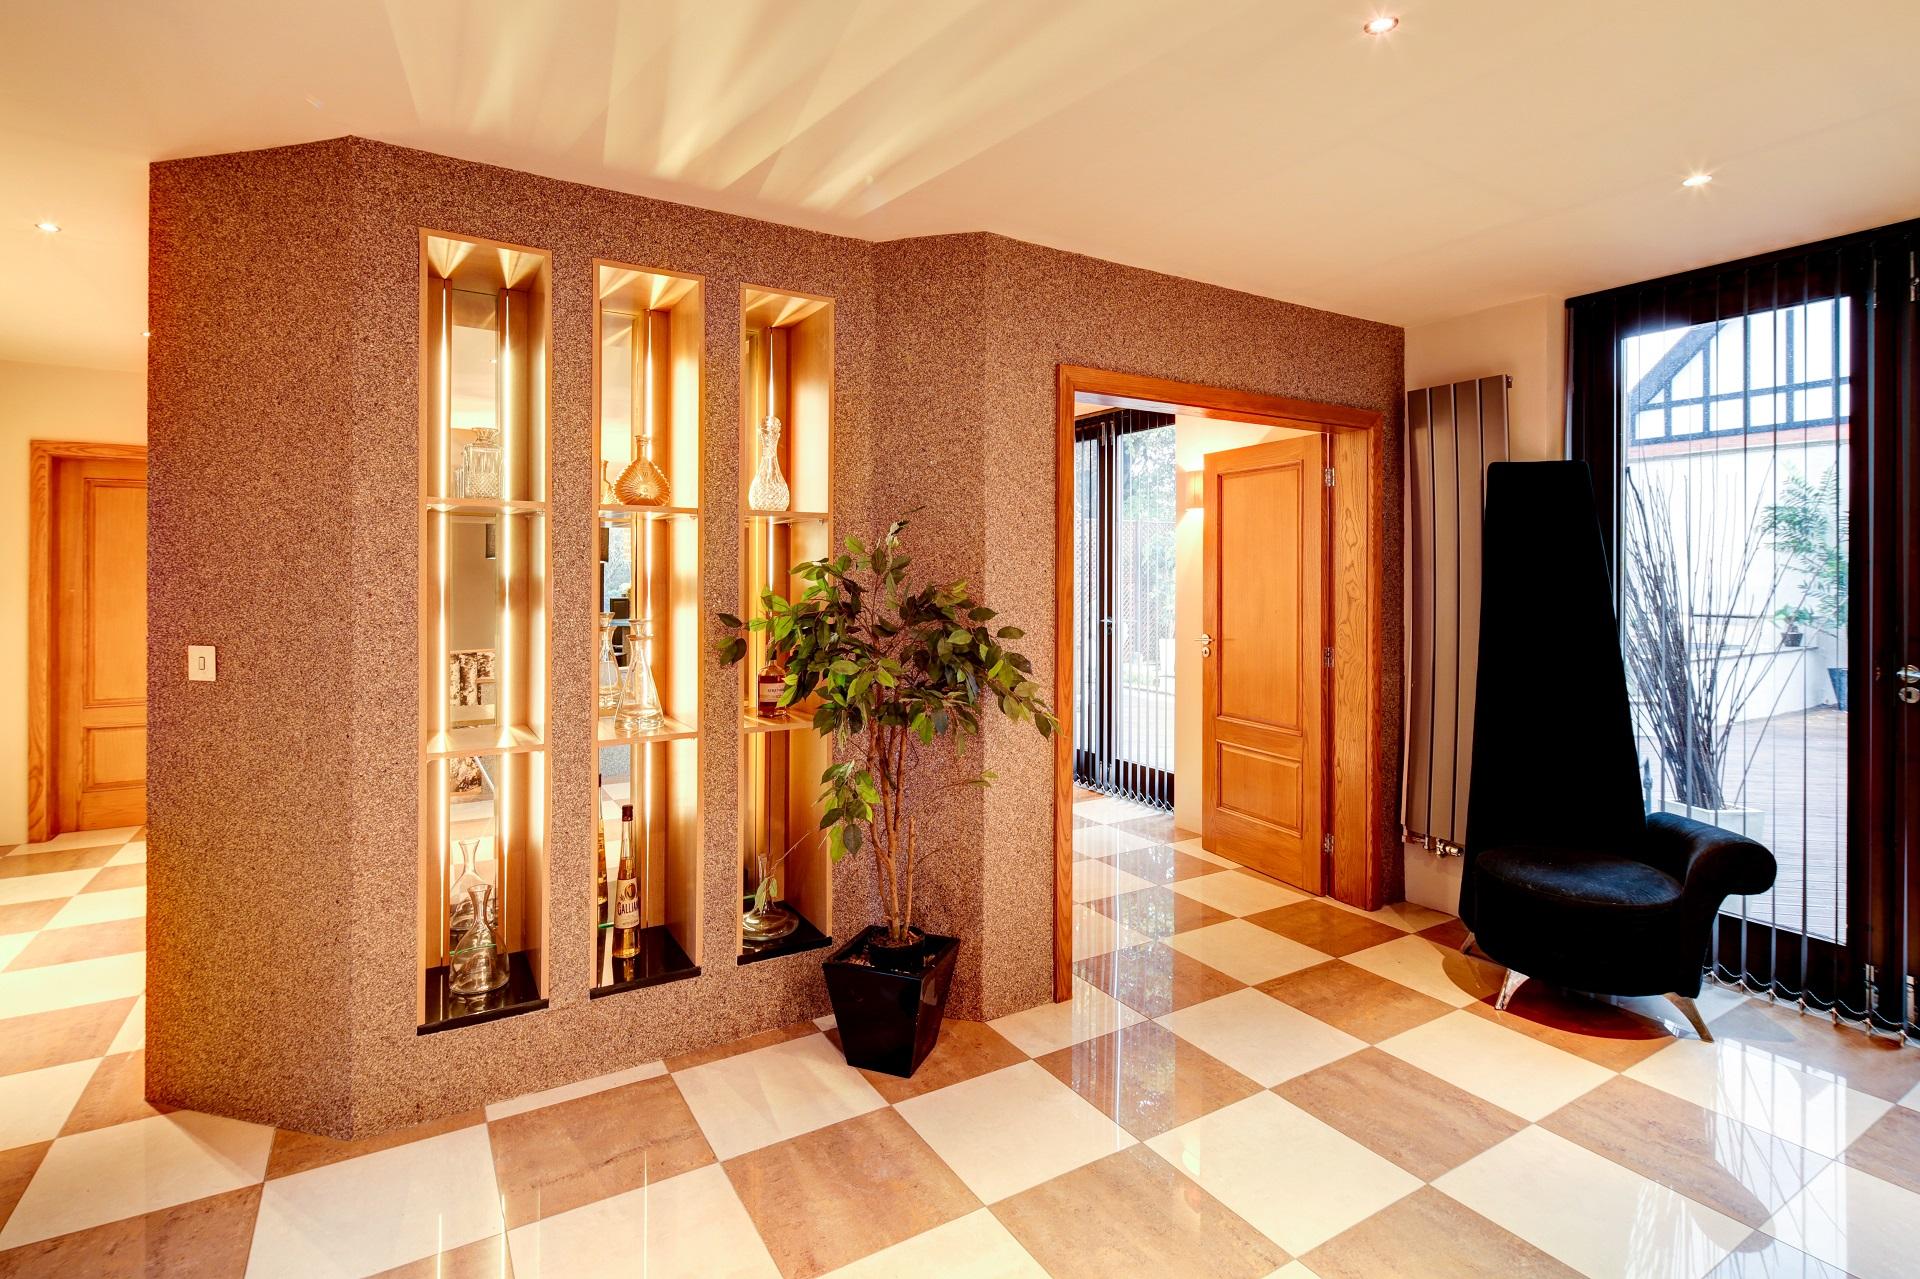 cedar heights Nottingham, gold leaf wallpaper, throne armchair, shelf lighting